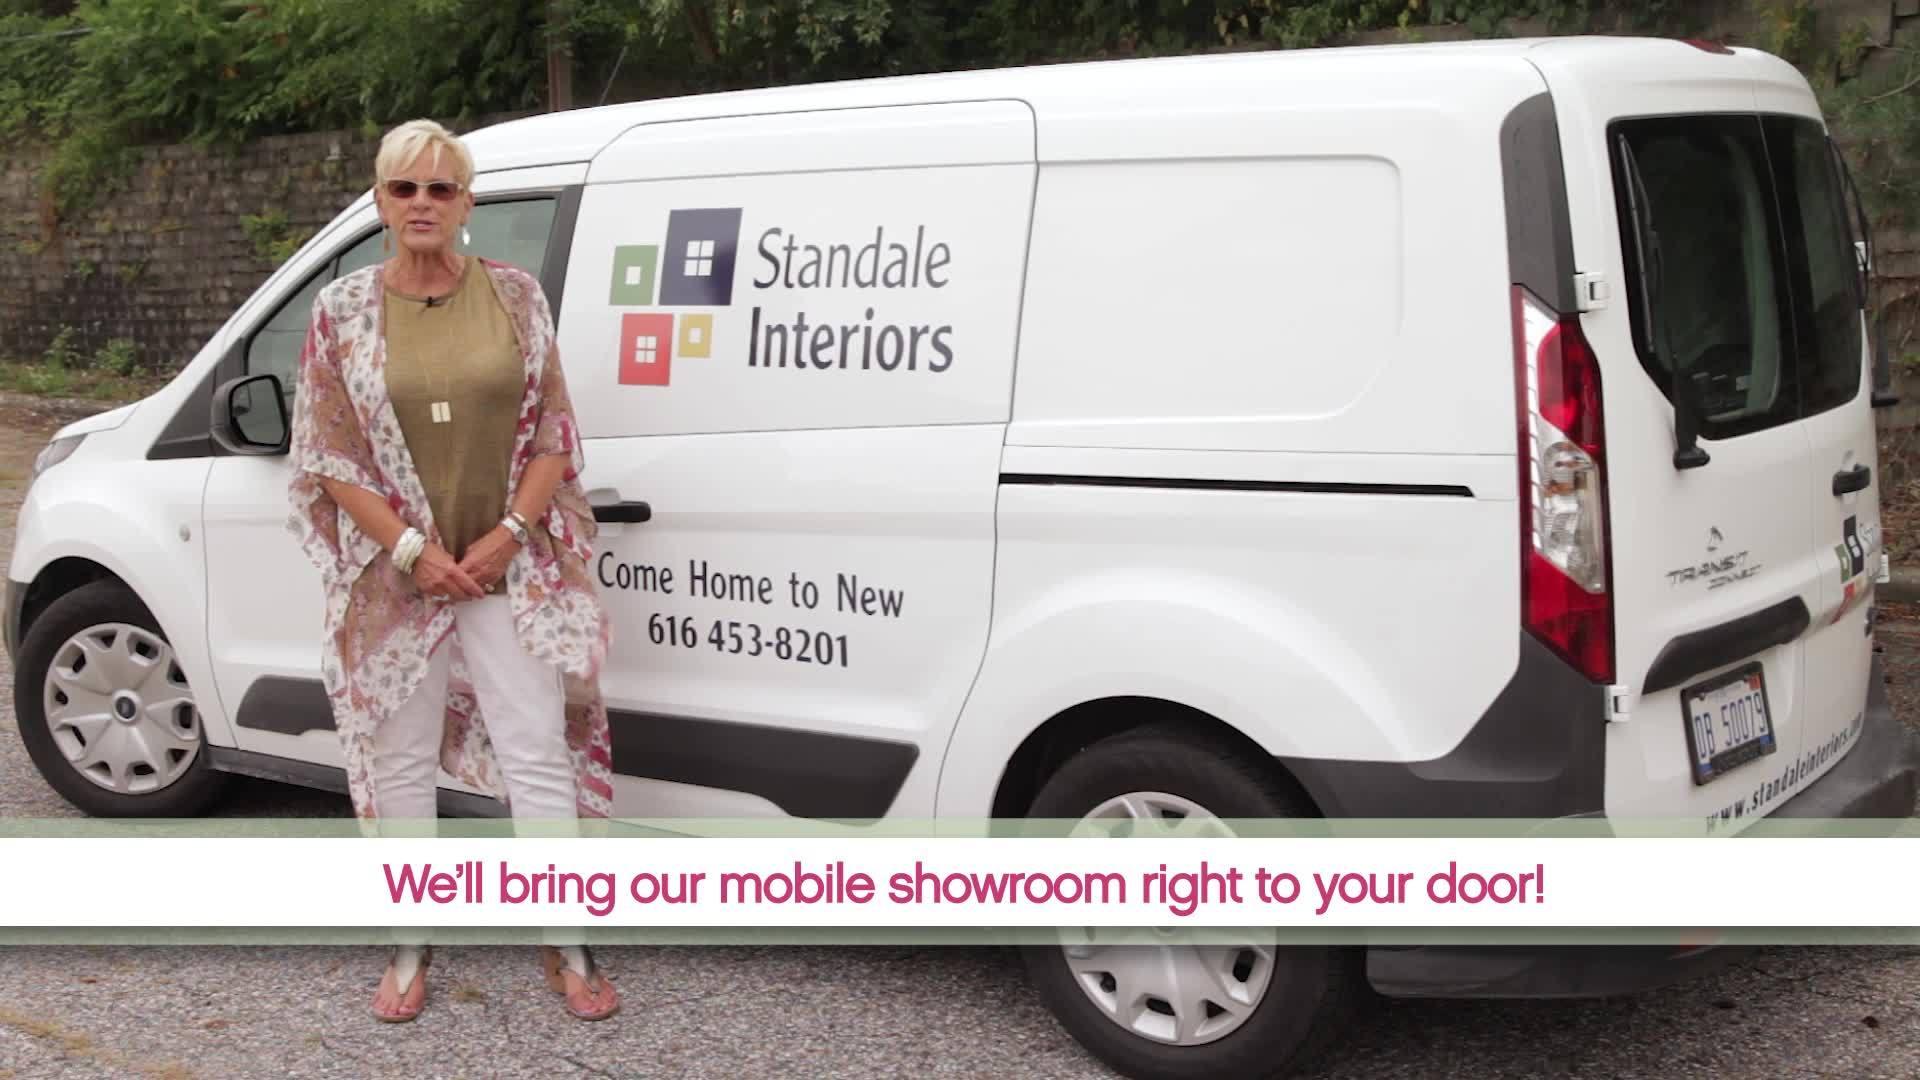 Floors_to_your_doors__Standale_Interiors_0_20181018190546